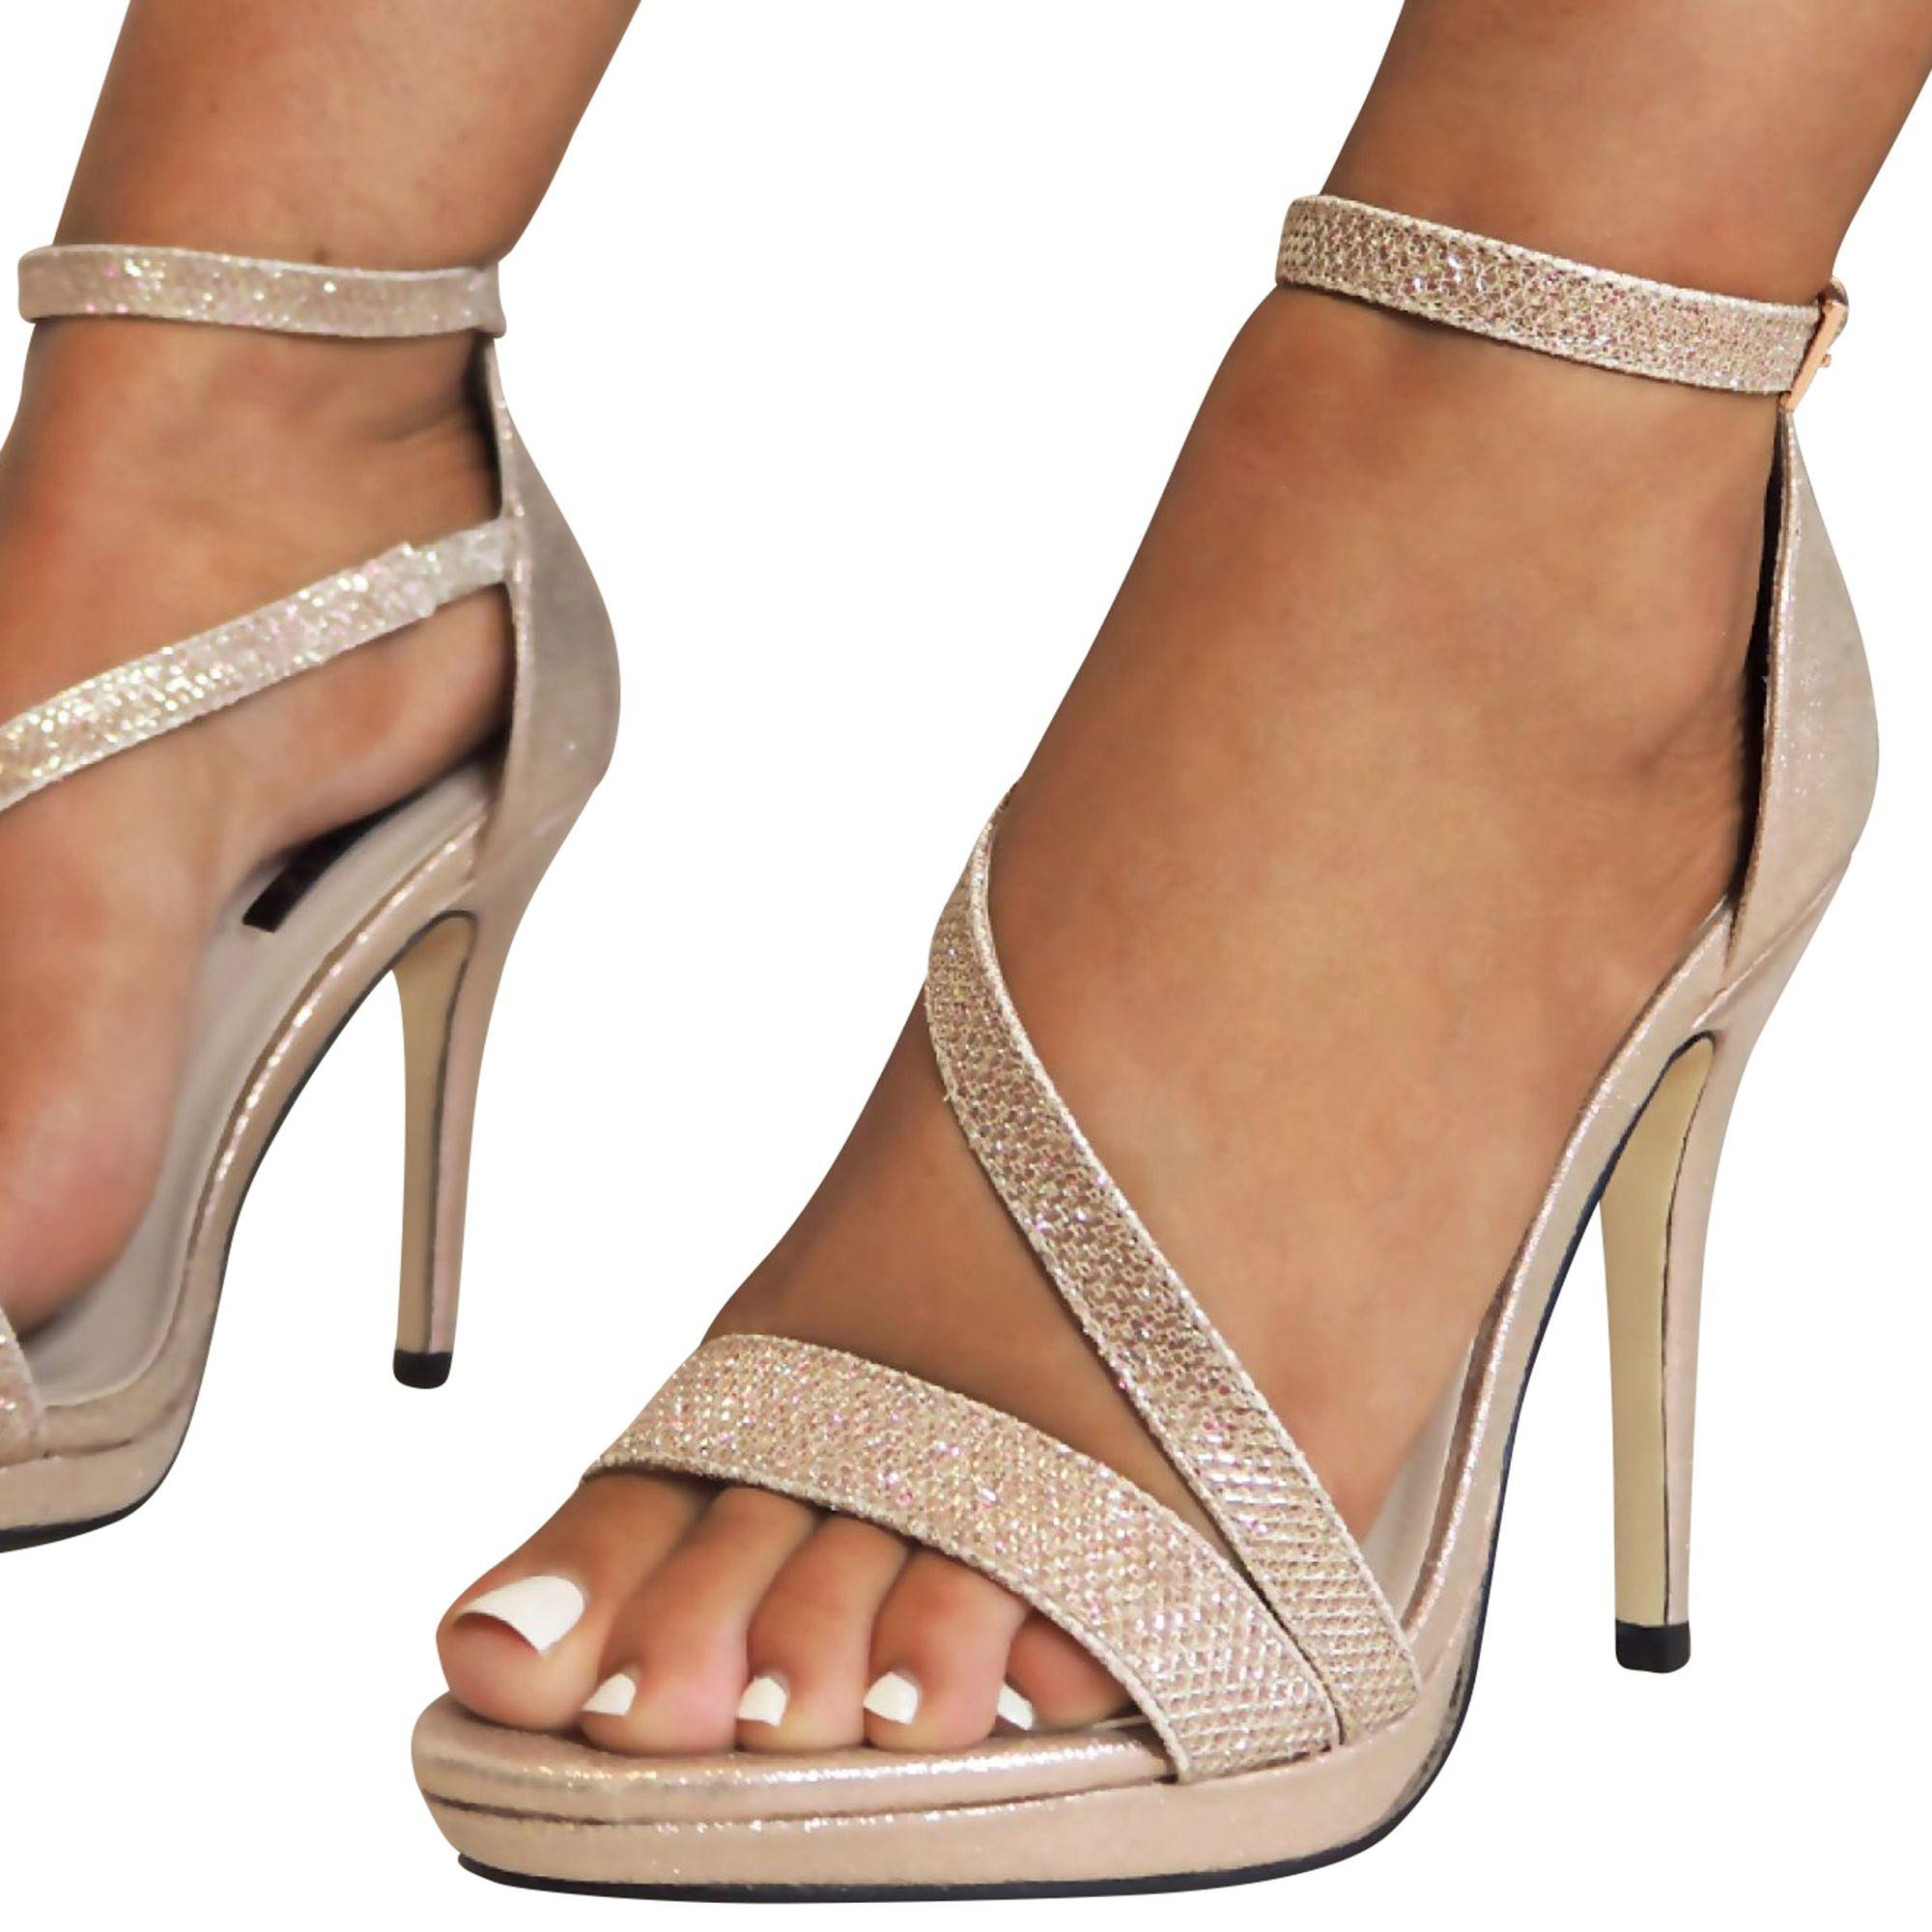 a70e860b5412 Quiz Gabby S Rose Gold Shimmer Strap Heel Sandals in Metallic - Lyst